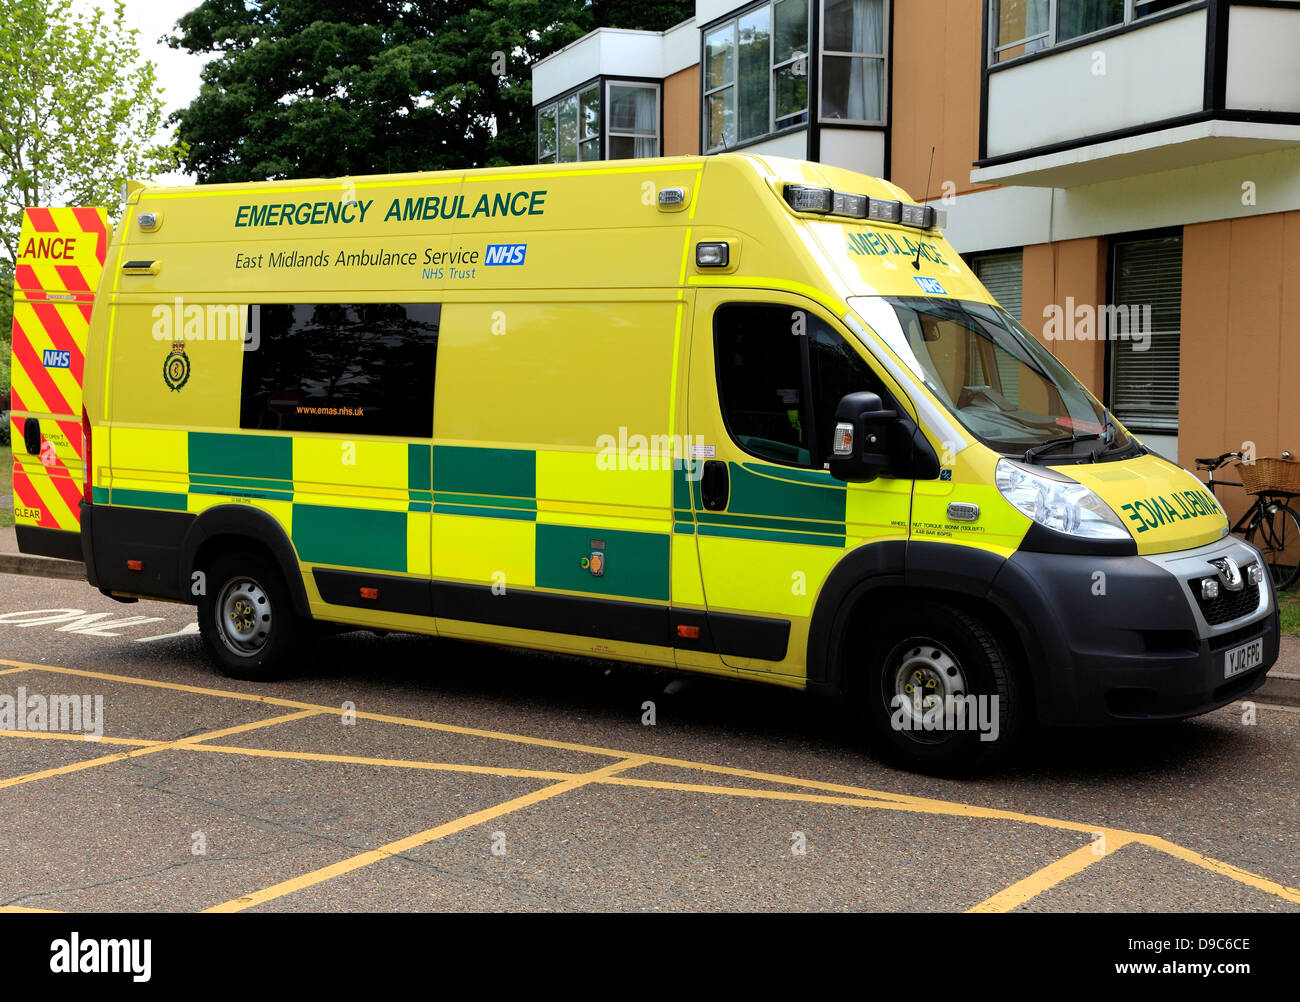 East Midlands Emergency Ambulance Service van, NHS, Kings Lynn, Norfolk, England, English ambulances, vehicle - Stock Image